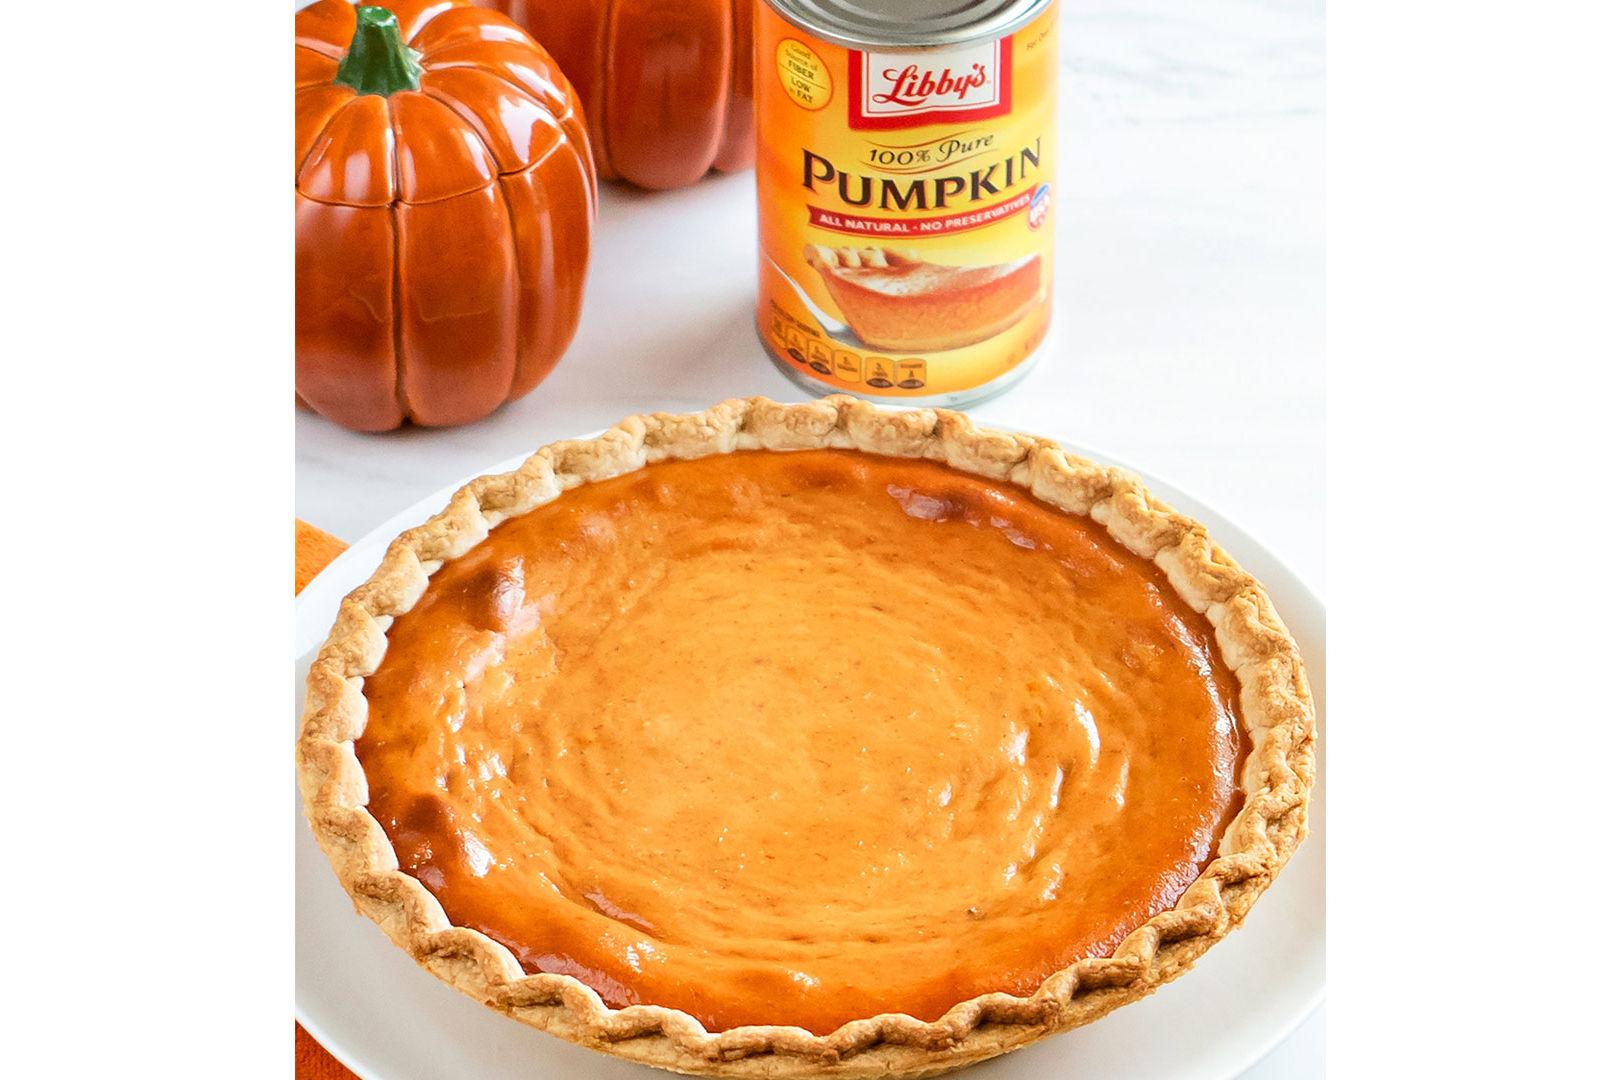 New Libby's Pumpkin Pie